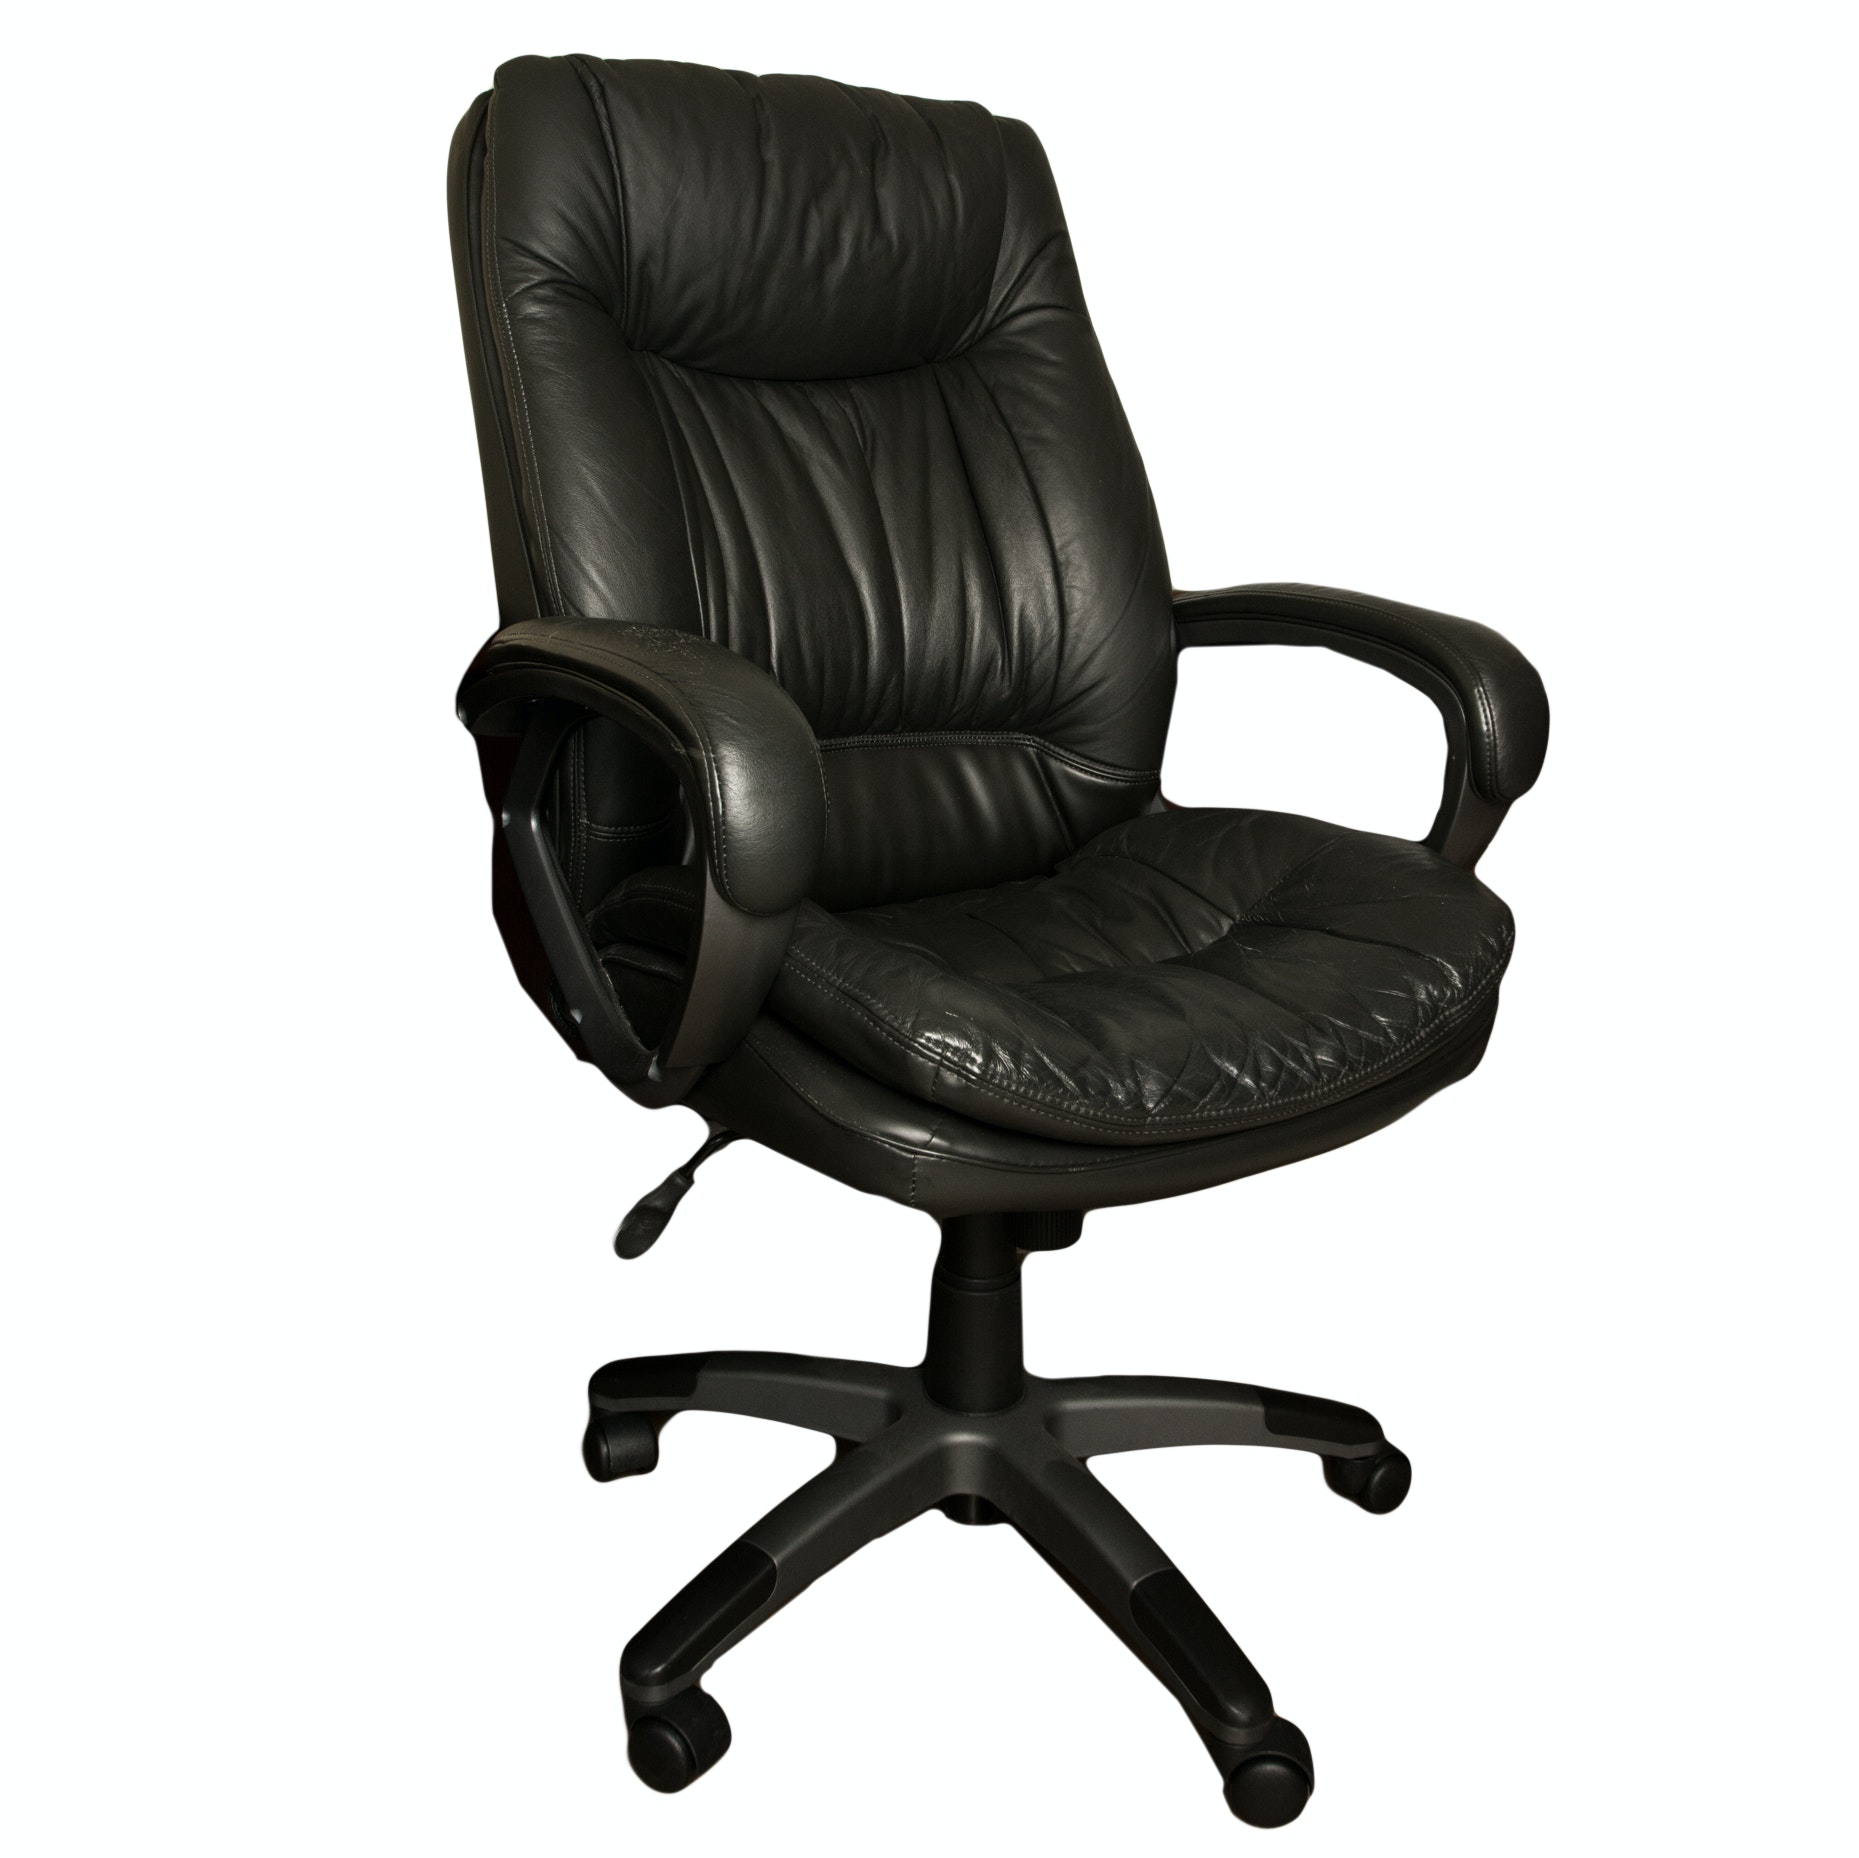 "Furniture at Work ""Harrington"" Office Chair"